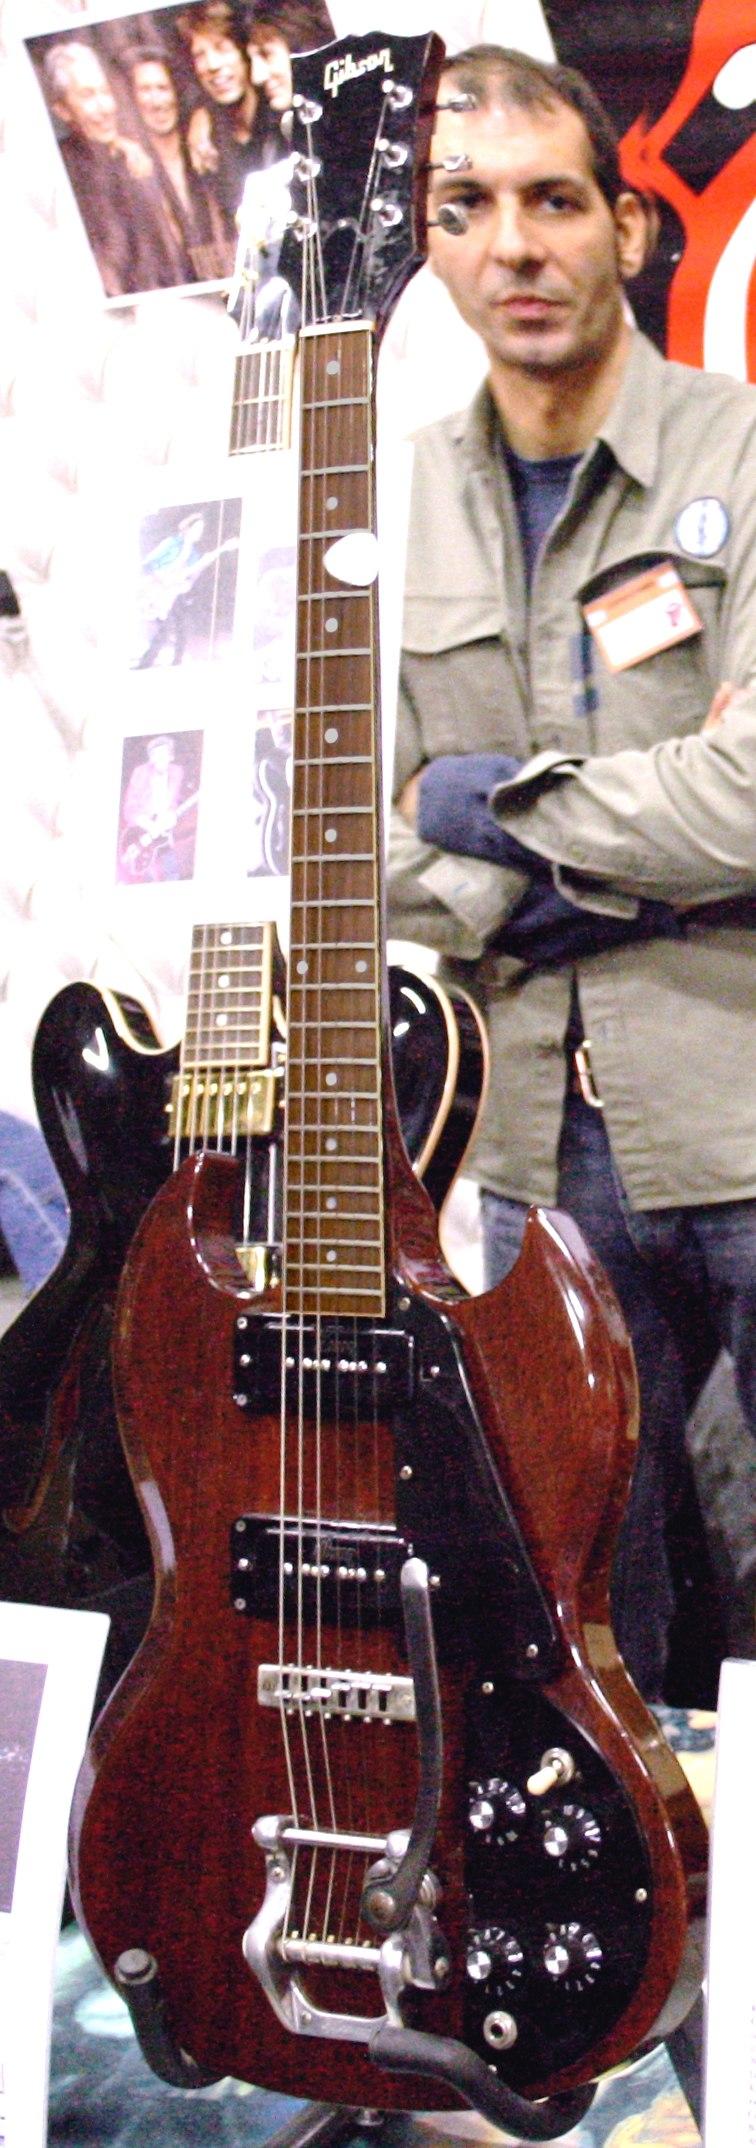 Gibson SG Pro @ SHG 30